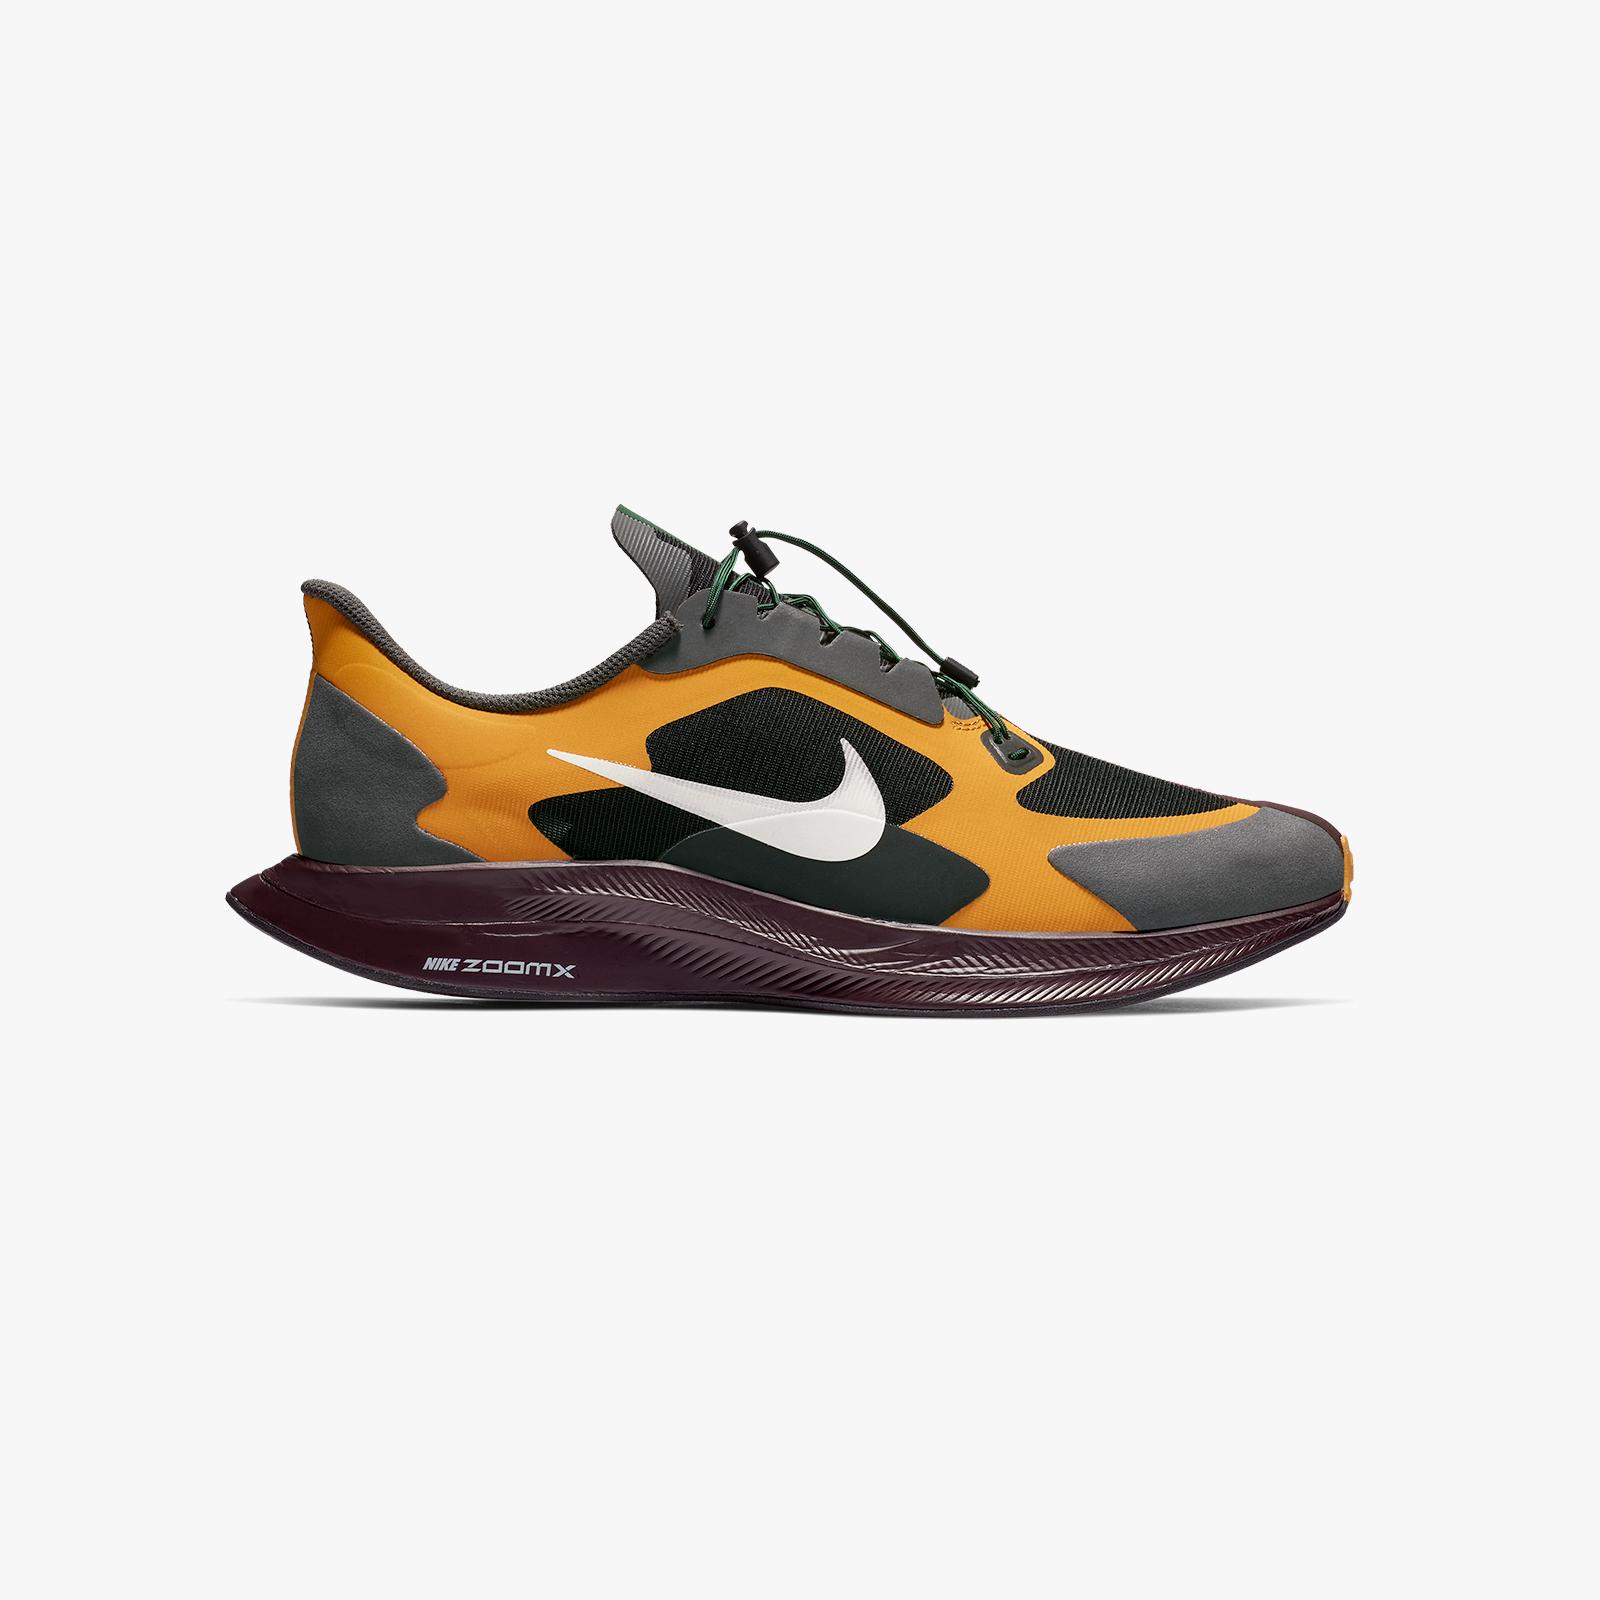 afdee597f238b Nike Zoom Pegasus 35 Turbo x Gyakusou - Bq0579-700 - Sneakersnstuff ...